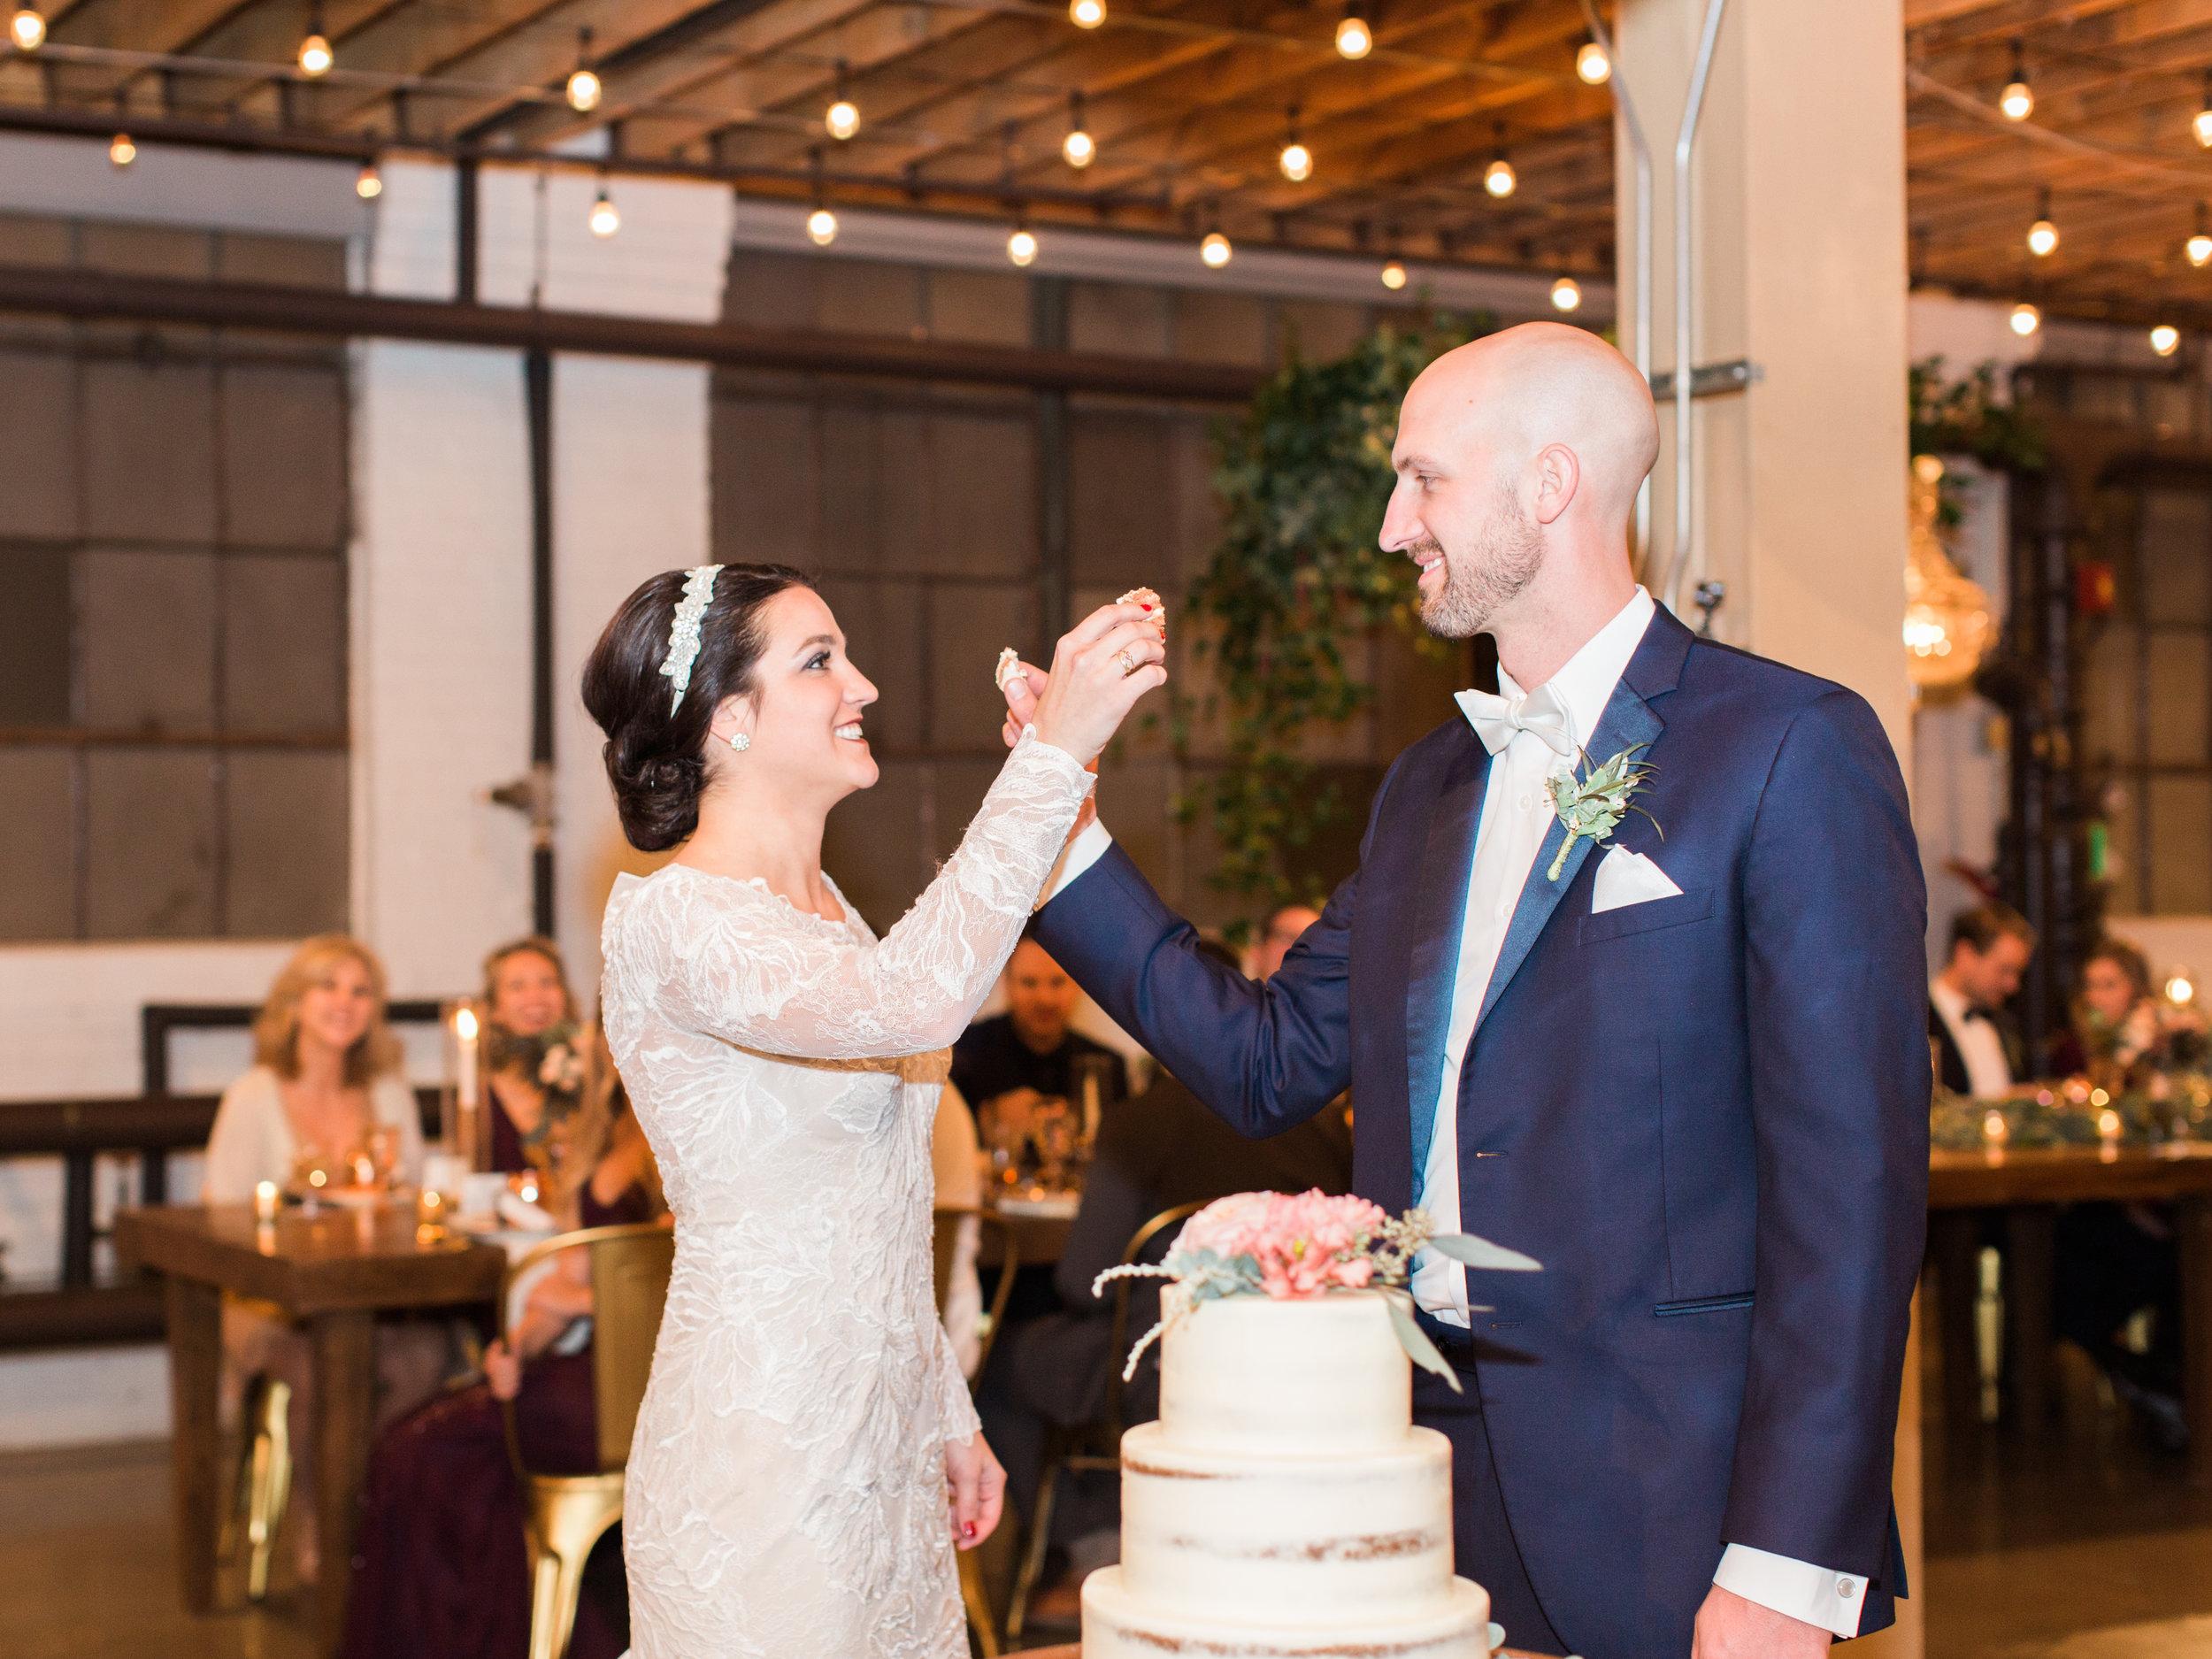 Vogelzang+Wedding+Receptiona-39.jpg